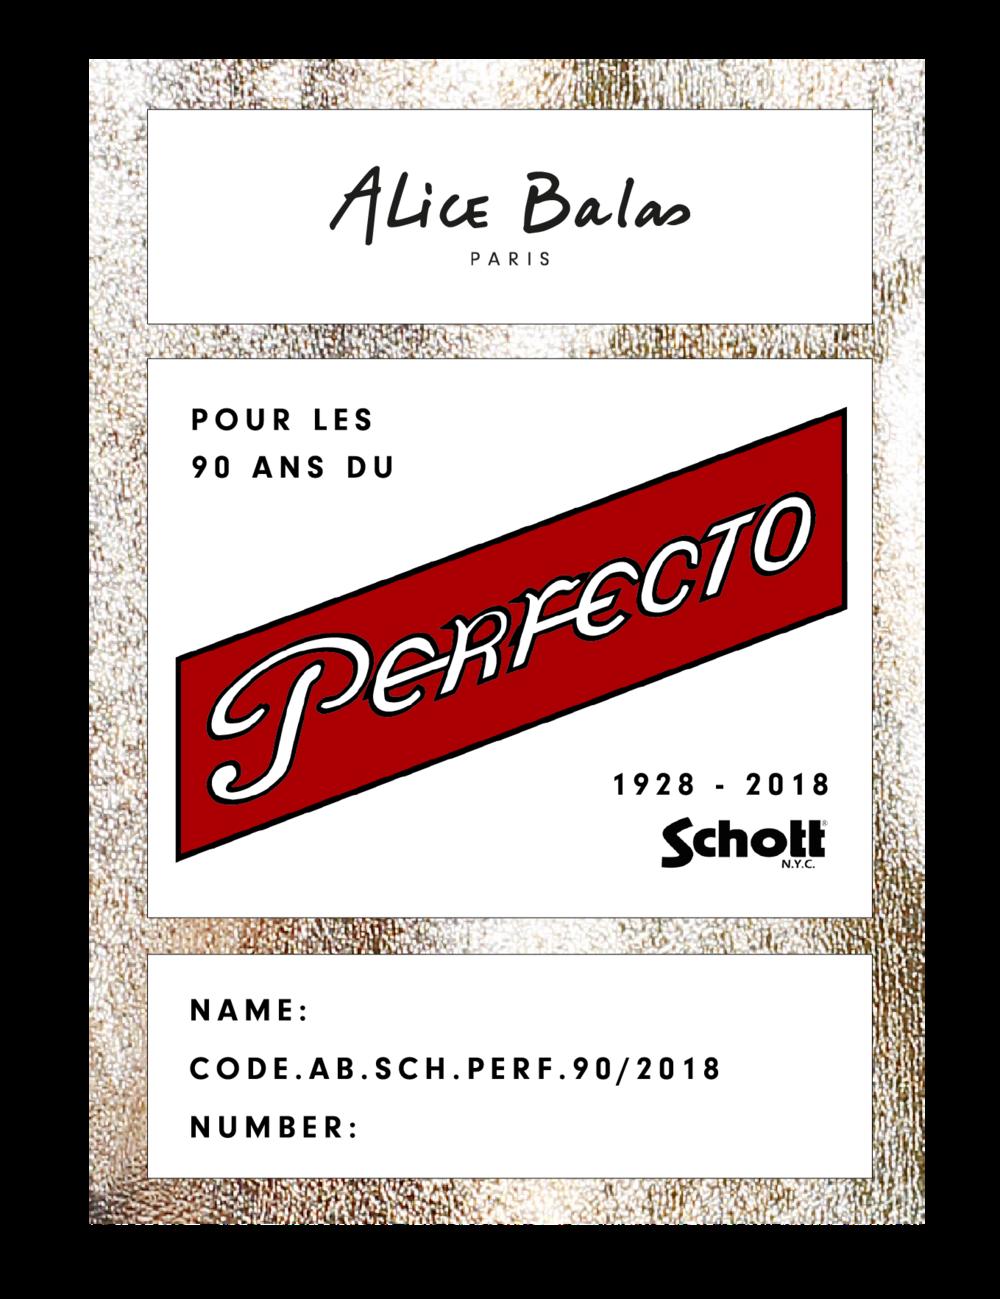 Schott x AB_label ok-0'-03.png